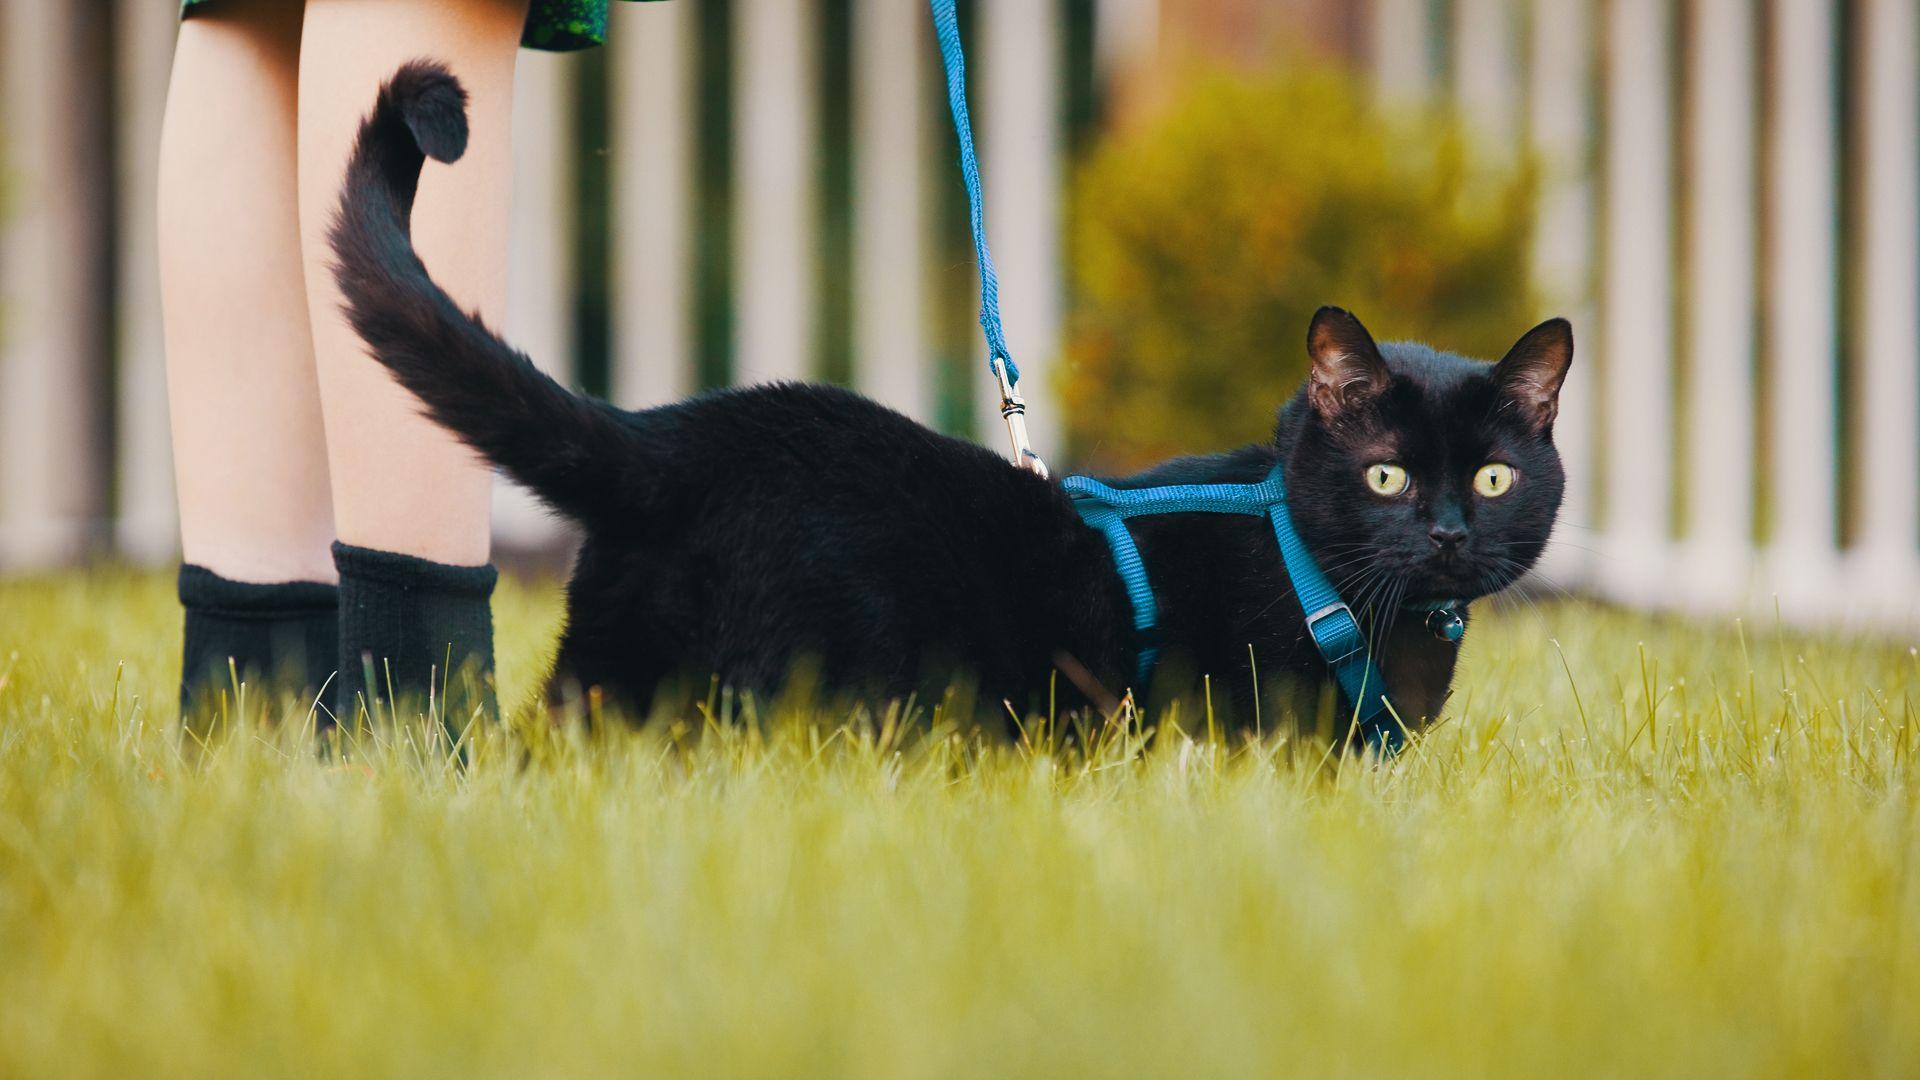 Leash Walk My Cat Embrace Pet Insurance Cat Allergies Pet Insurance For Dogs